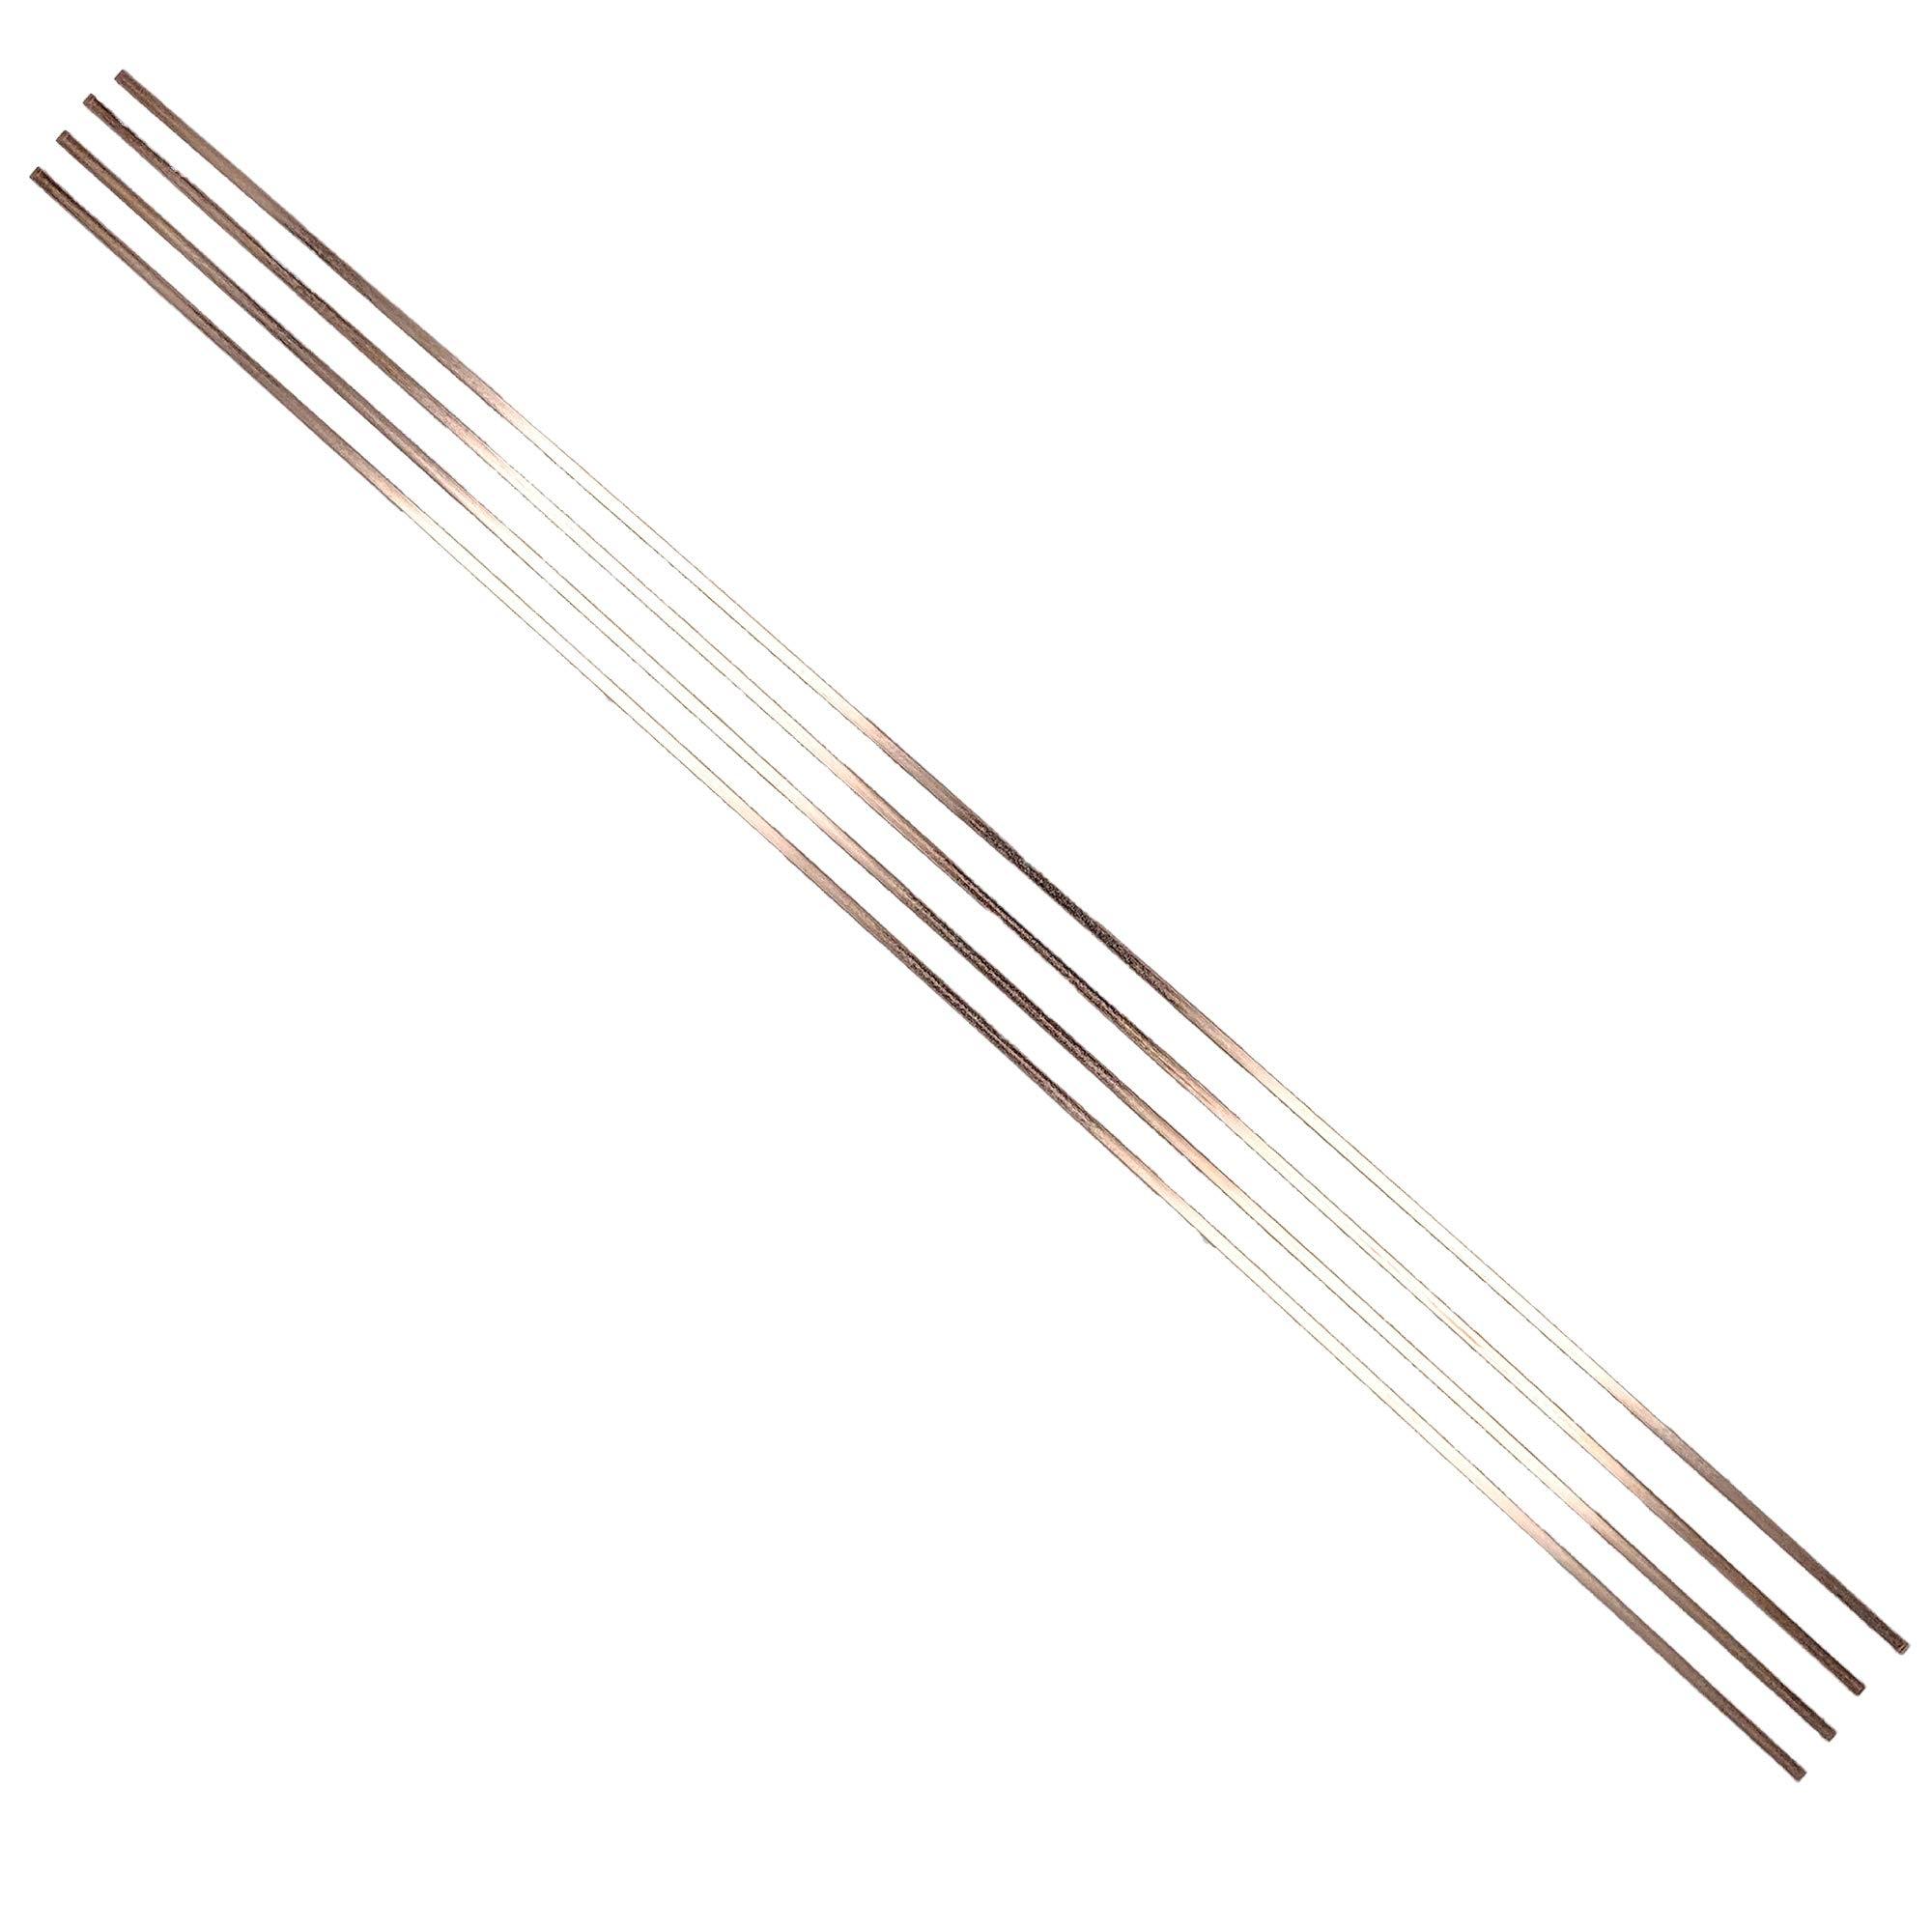 Supplying Demand 15% Silver Solder Brazing Rods 4 19.5'' Sticks Perfect For HVAC Refrigeration